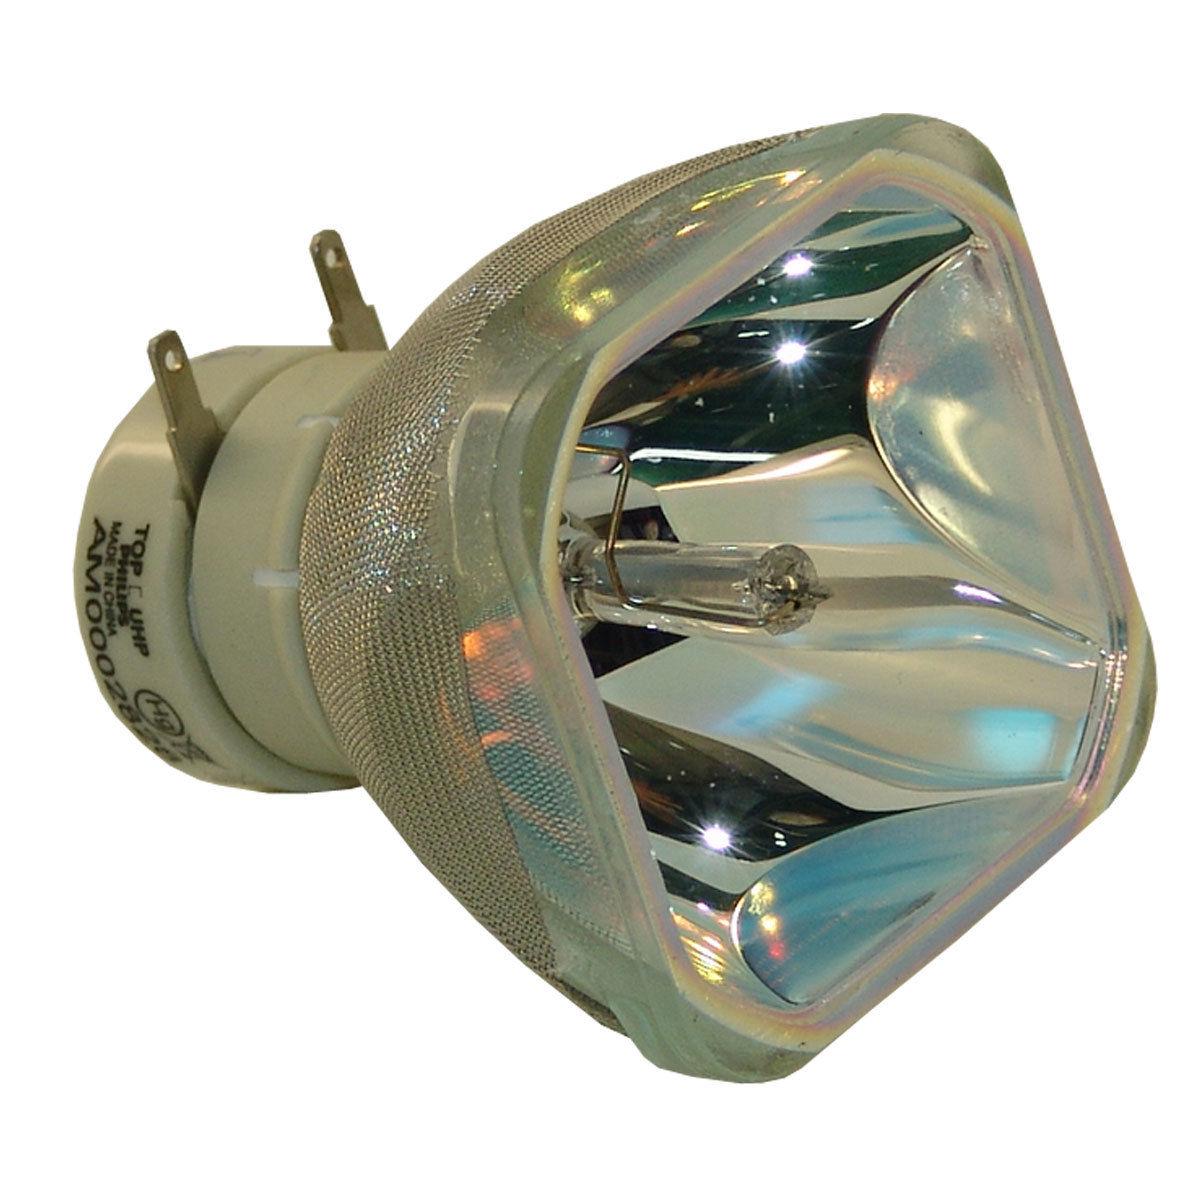 Compatible Bare Bulb POA-LMP132 LMP132 610-345-2456 for SANYO PLC-XW300 PLC-XW250 PLC-XW200 PLC-XE33 PLC-XW250K Projector Lamp 610 349 7518 poa lmp142 original bare lamp for sanyo plc wk2500 plc xd2600 xd2200 plc xe34 plc xk2200 plc xk2600 plc xk3010